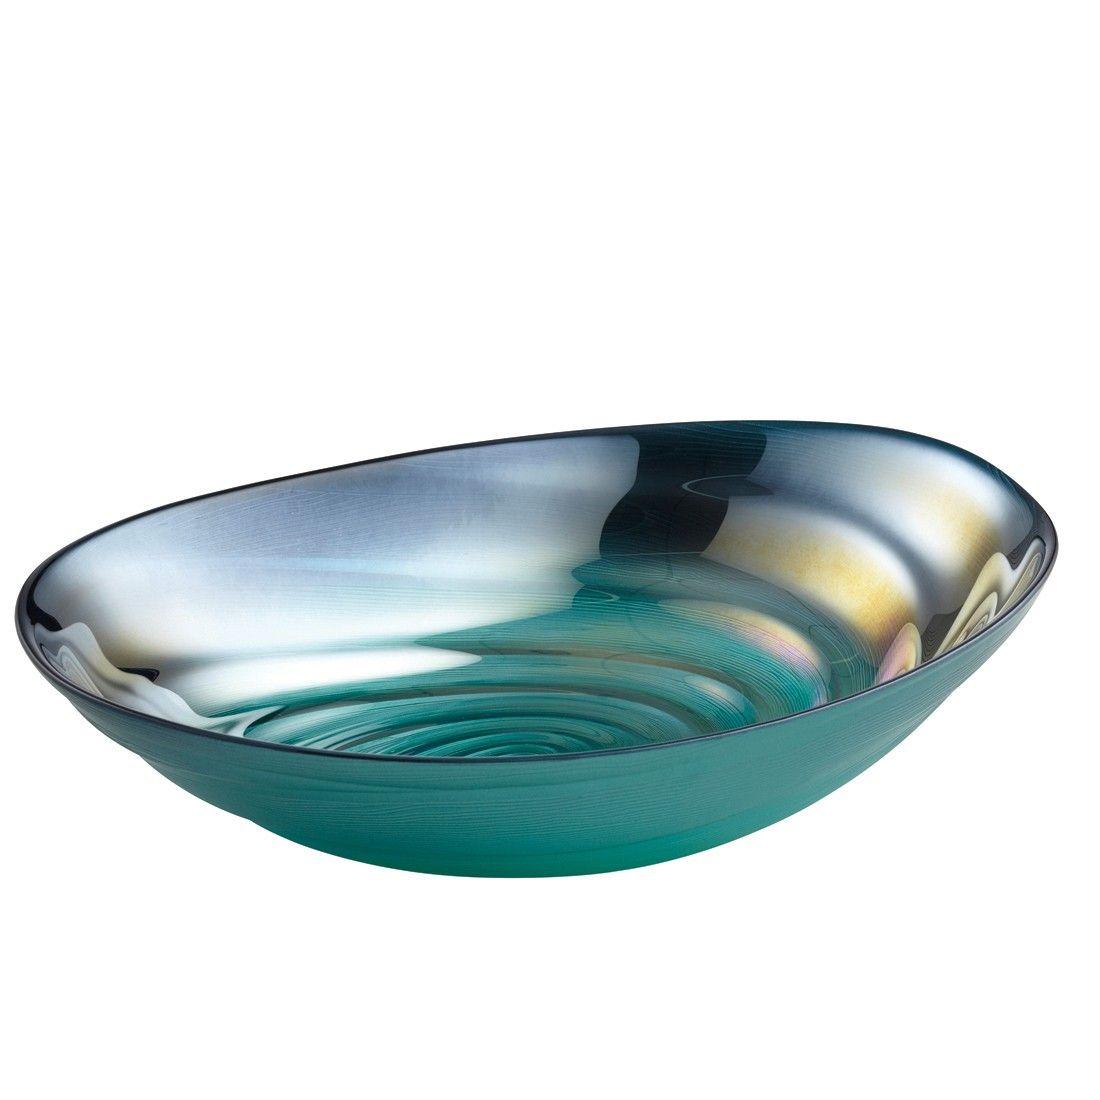 Perla Bowl Oval Teal 32cm Decorative Bowls Blue Glass Bowl